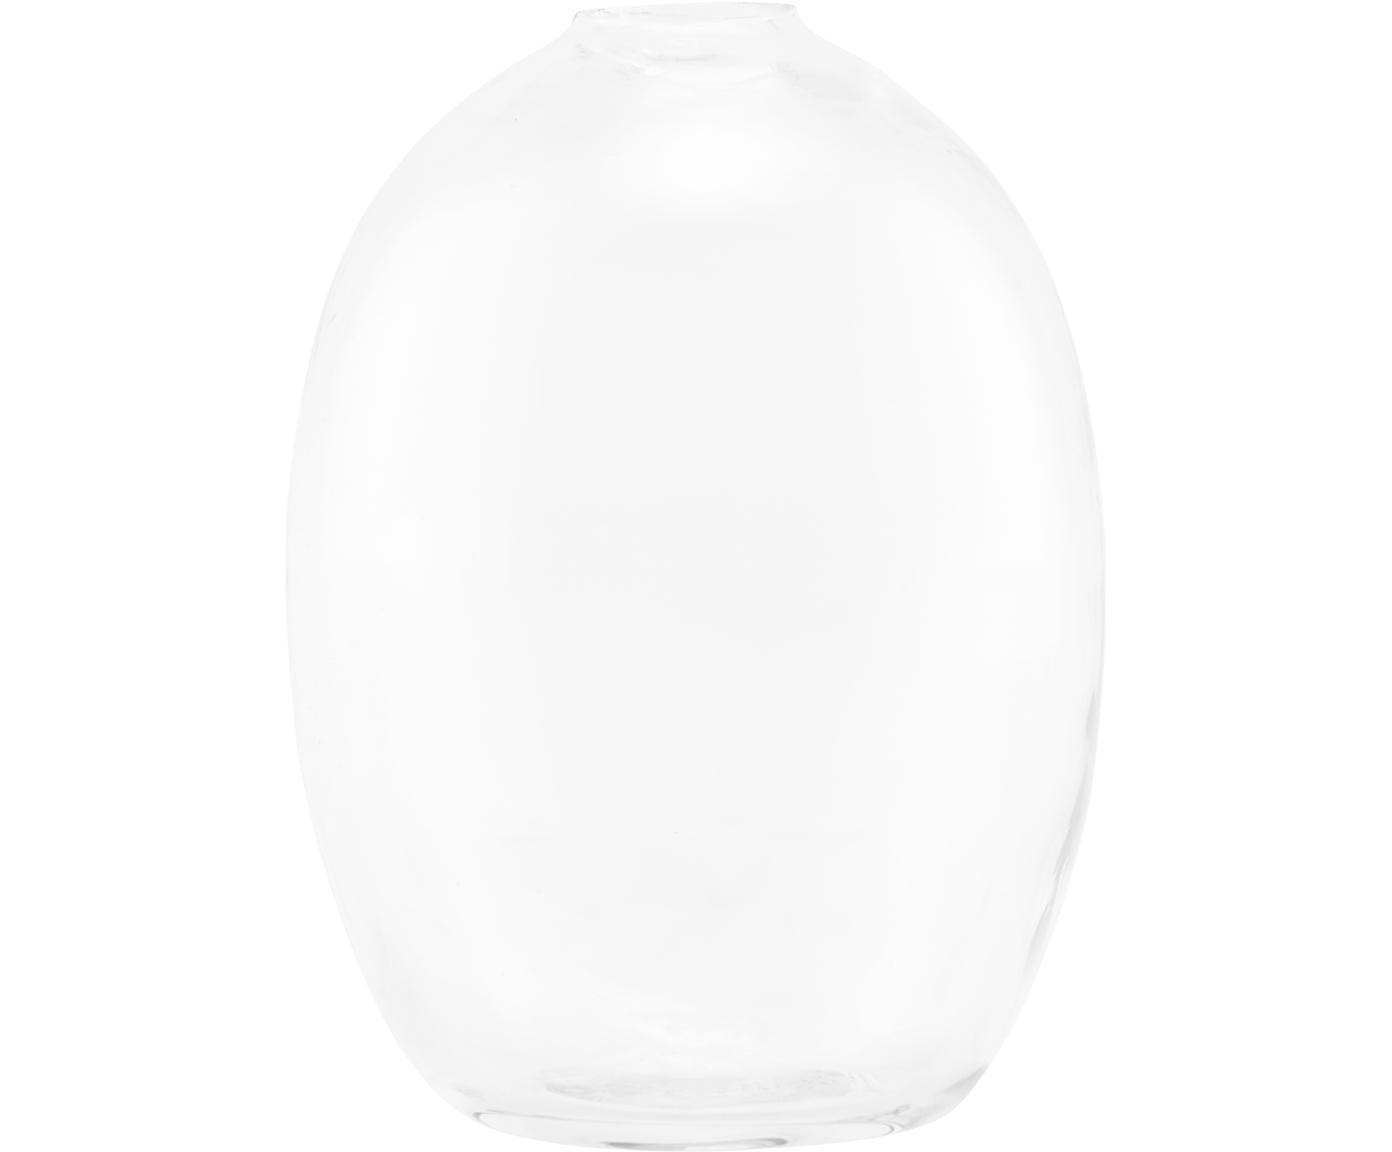 Glas-Vase Sandra, Glas, Transparent, Ø 7 x H 10 cm